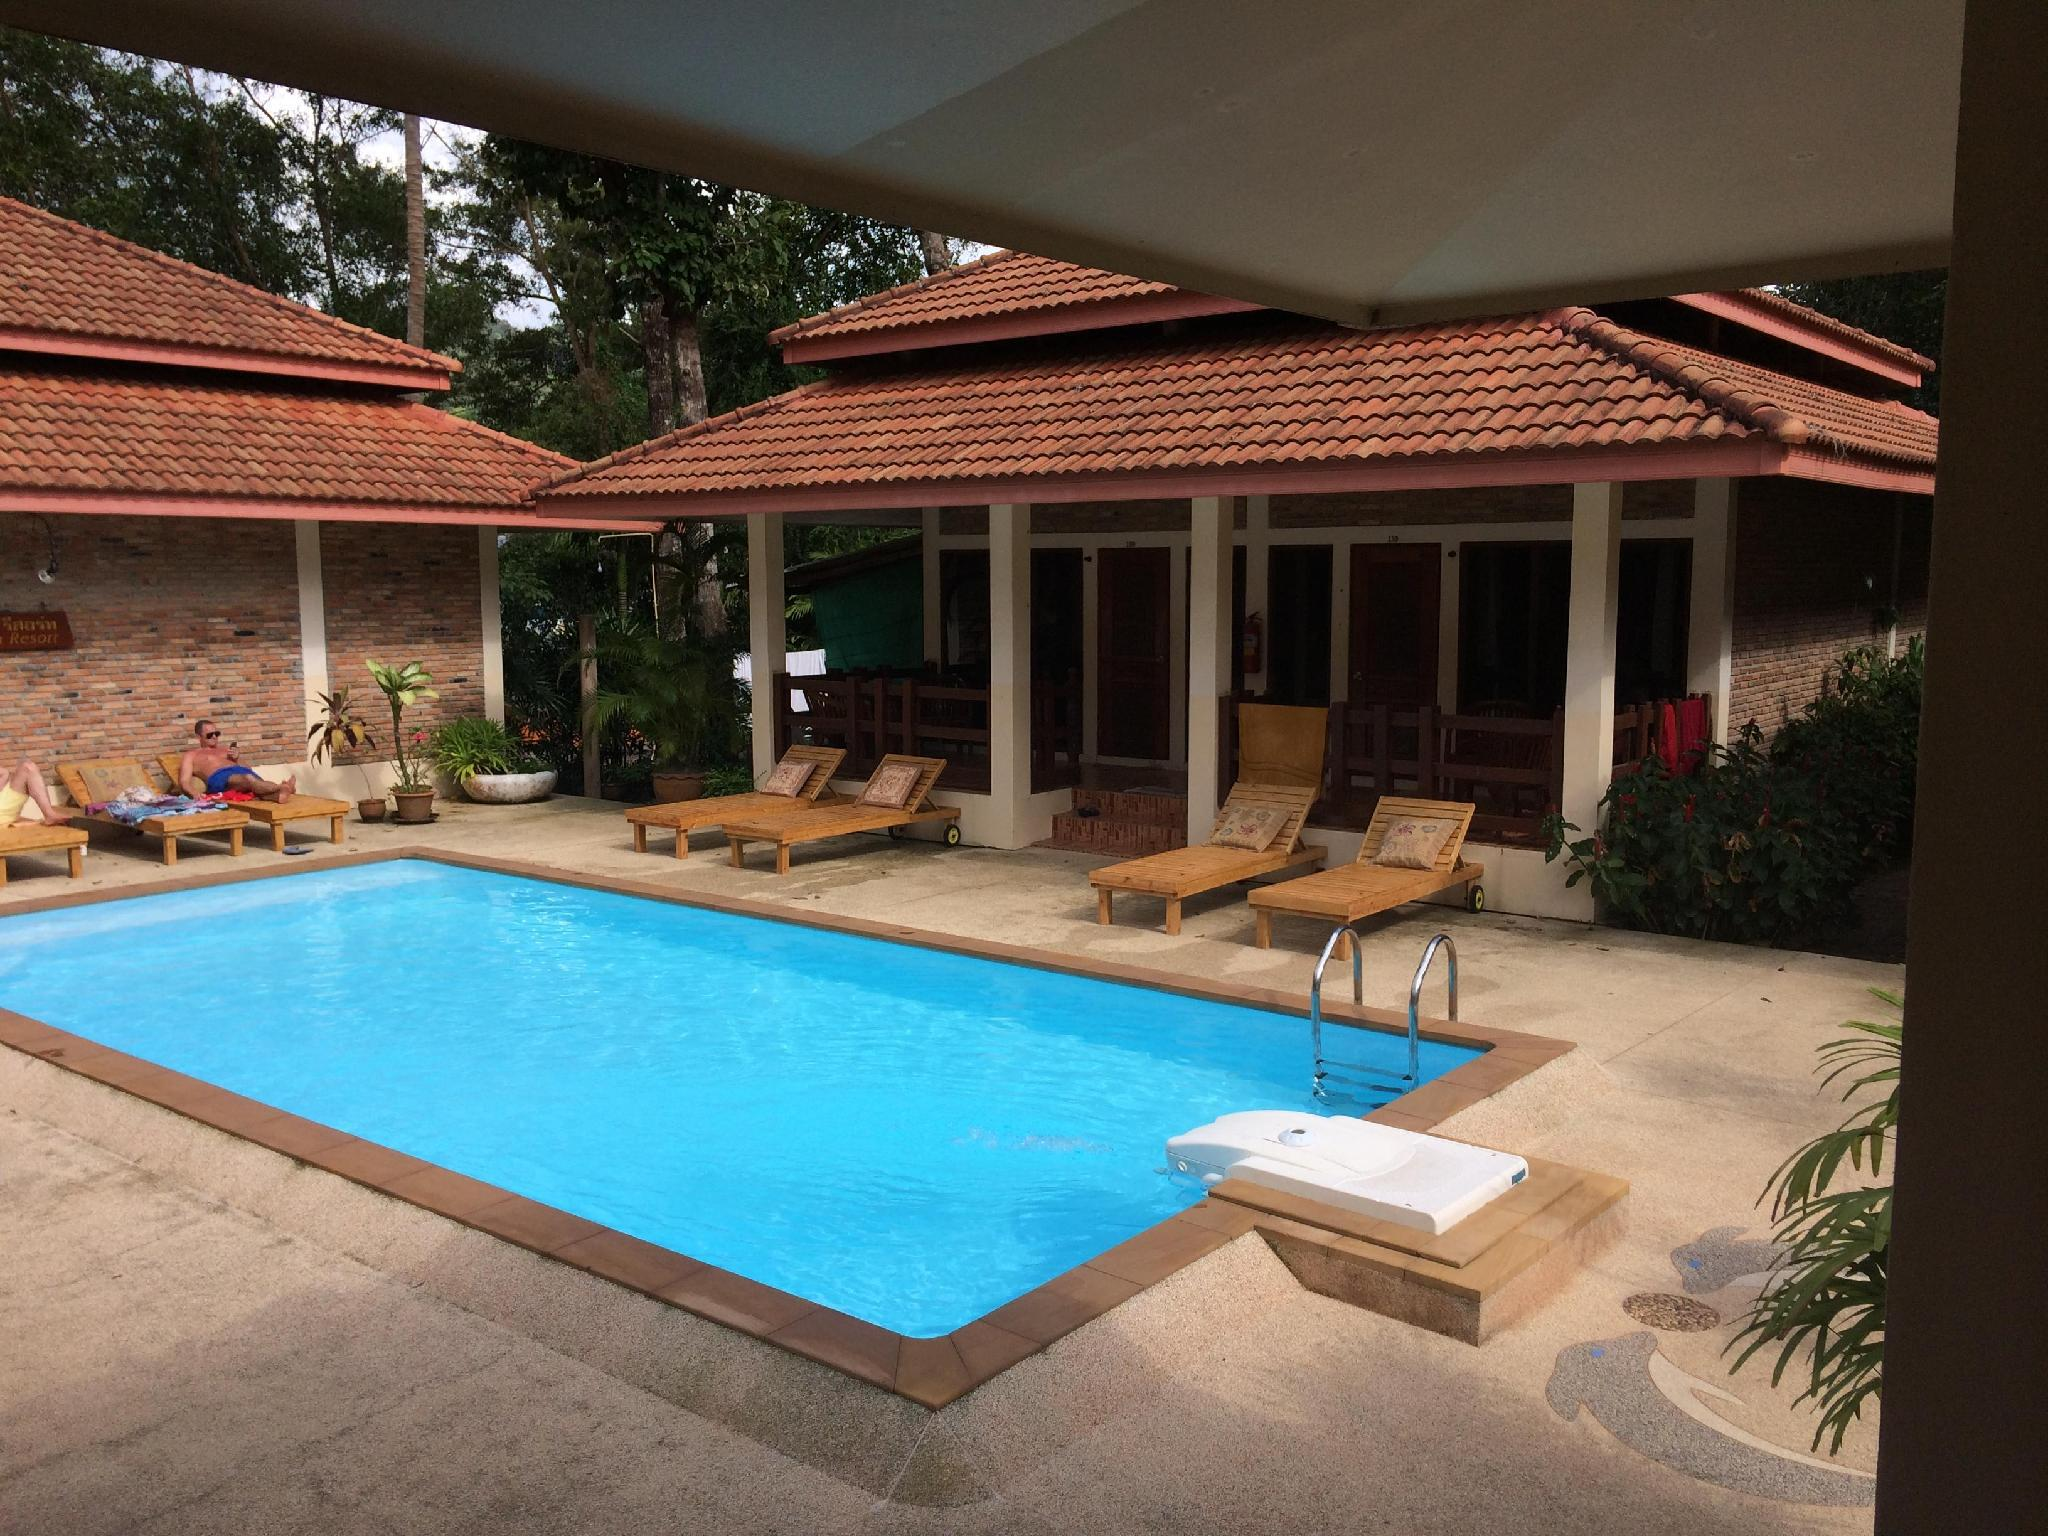 Chaya Resort ชายา รีสอร์ท